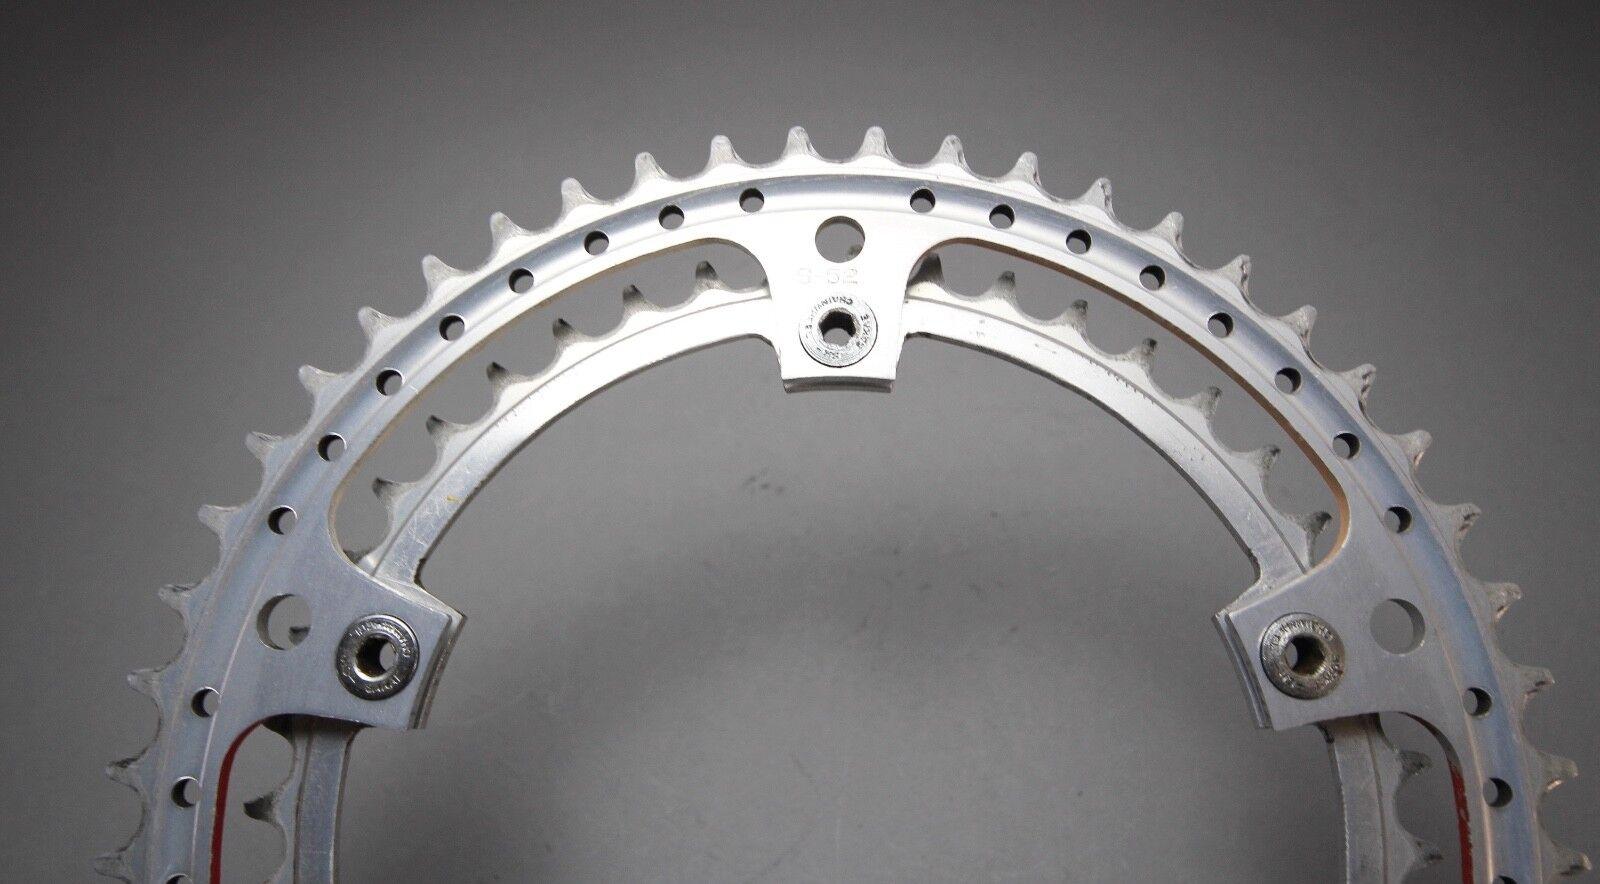 SR Royal Chain Rings Kettenblätter   52 42 T   BCD 144 mm   158g   Sakae Ringyo